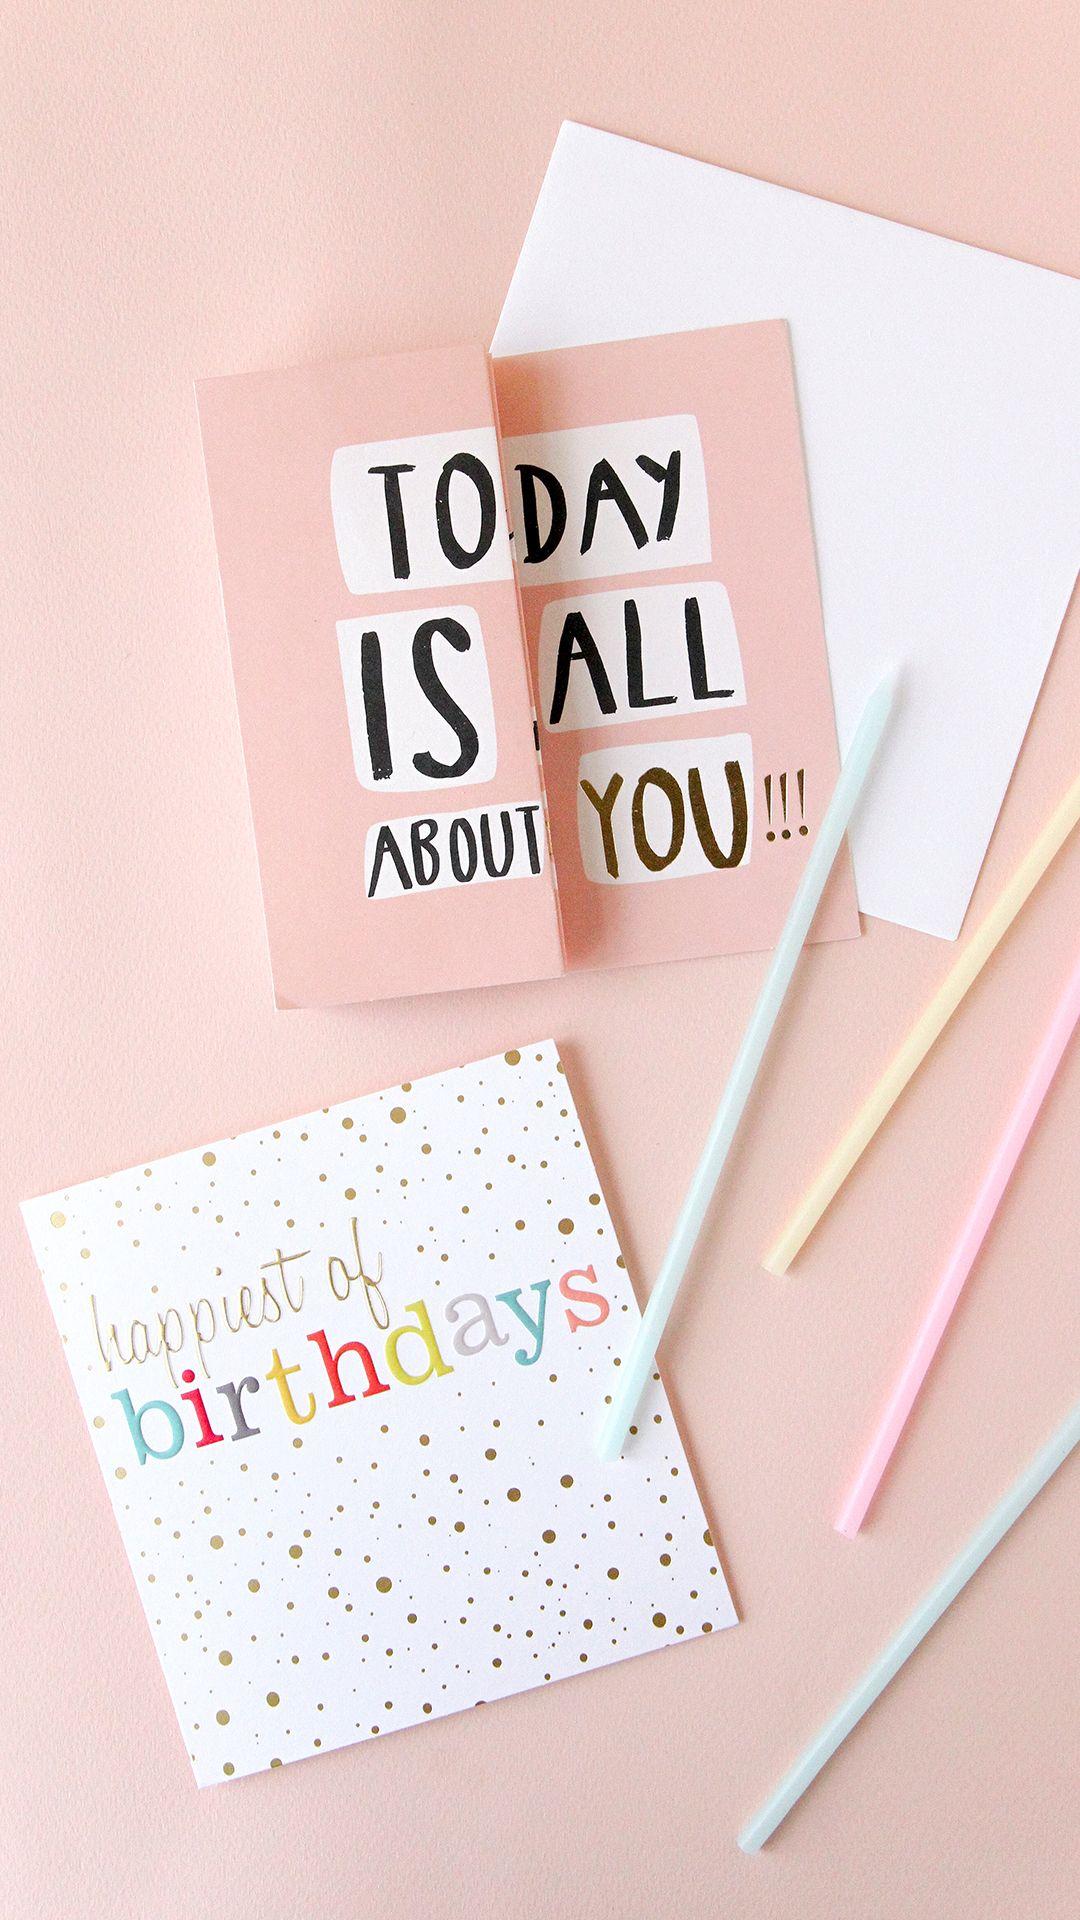 Designer Greetings Cards Greeting Card Inspiration Birthday Card Design Greeting Card Design